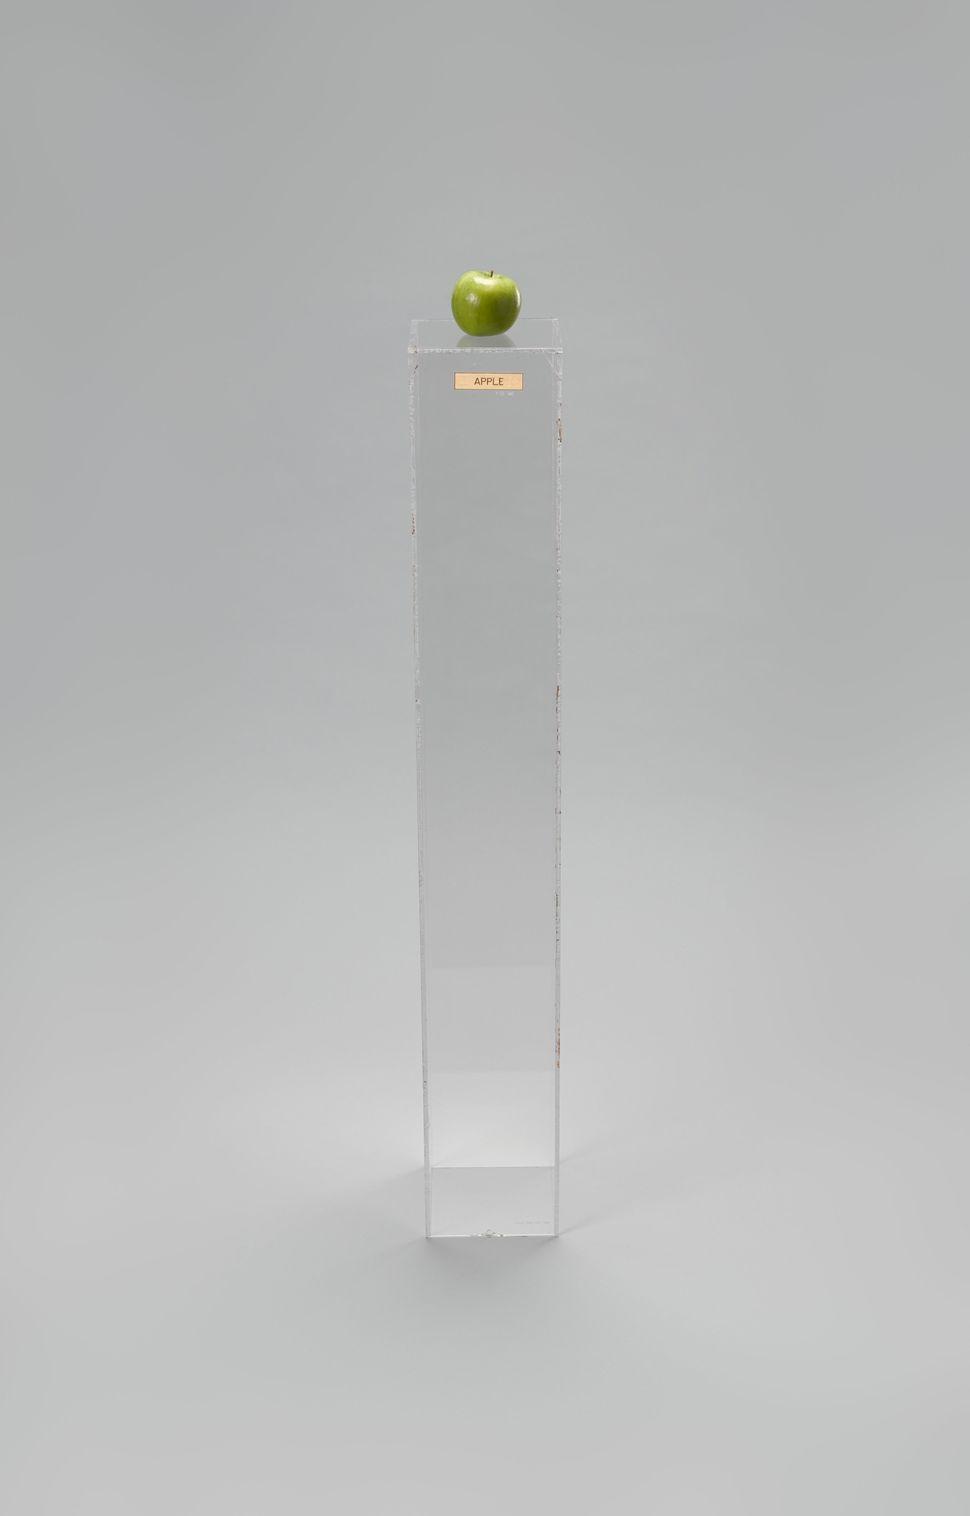 Yoko Ono (Japanese, born 1933) Apple. 1966. Plexiglas pedestal, brass plaque, apple, 45 × 6 11/16 × 6 15/16″ (114.3 × 17 × 17